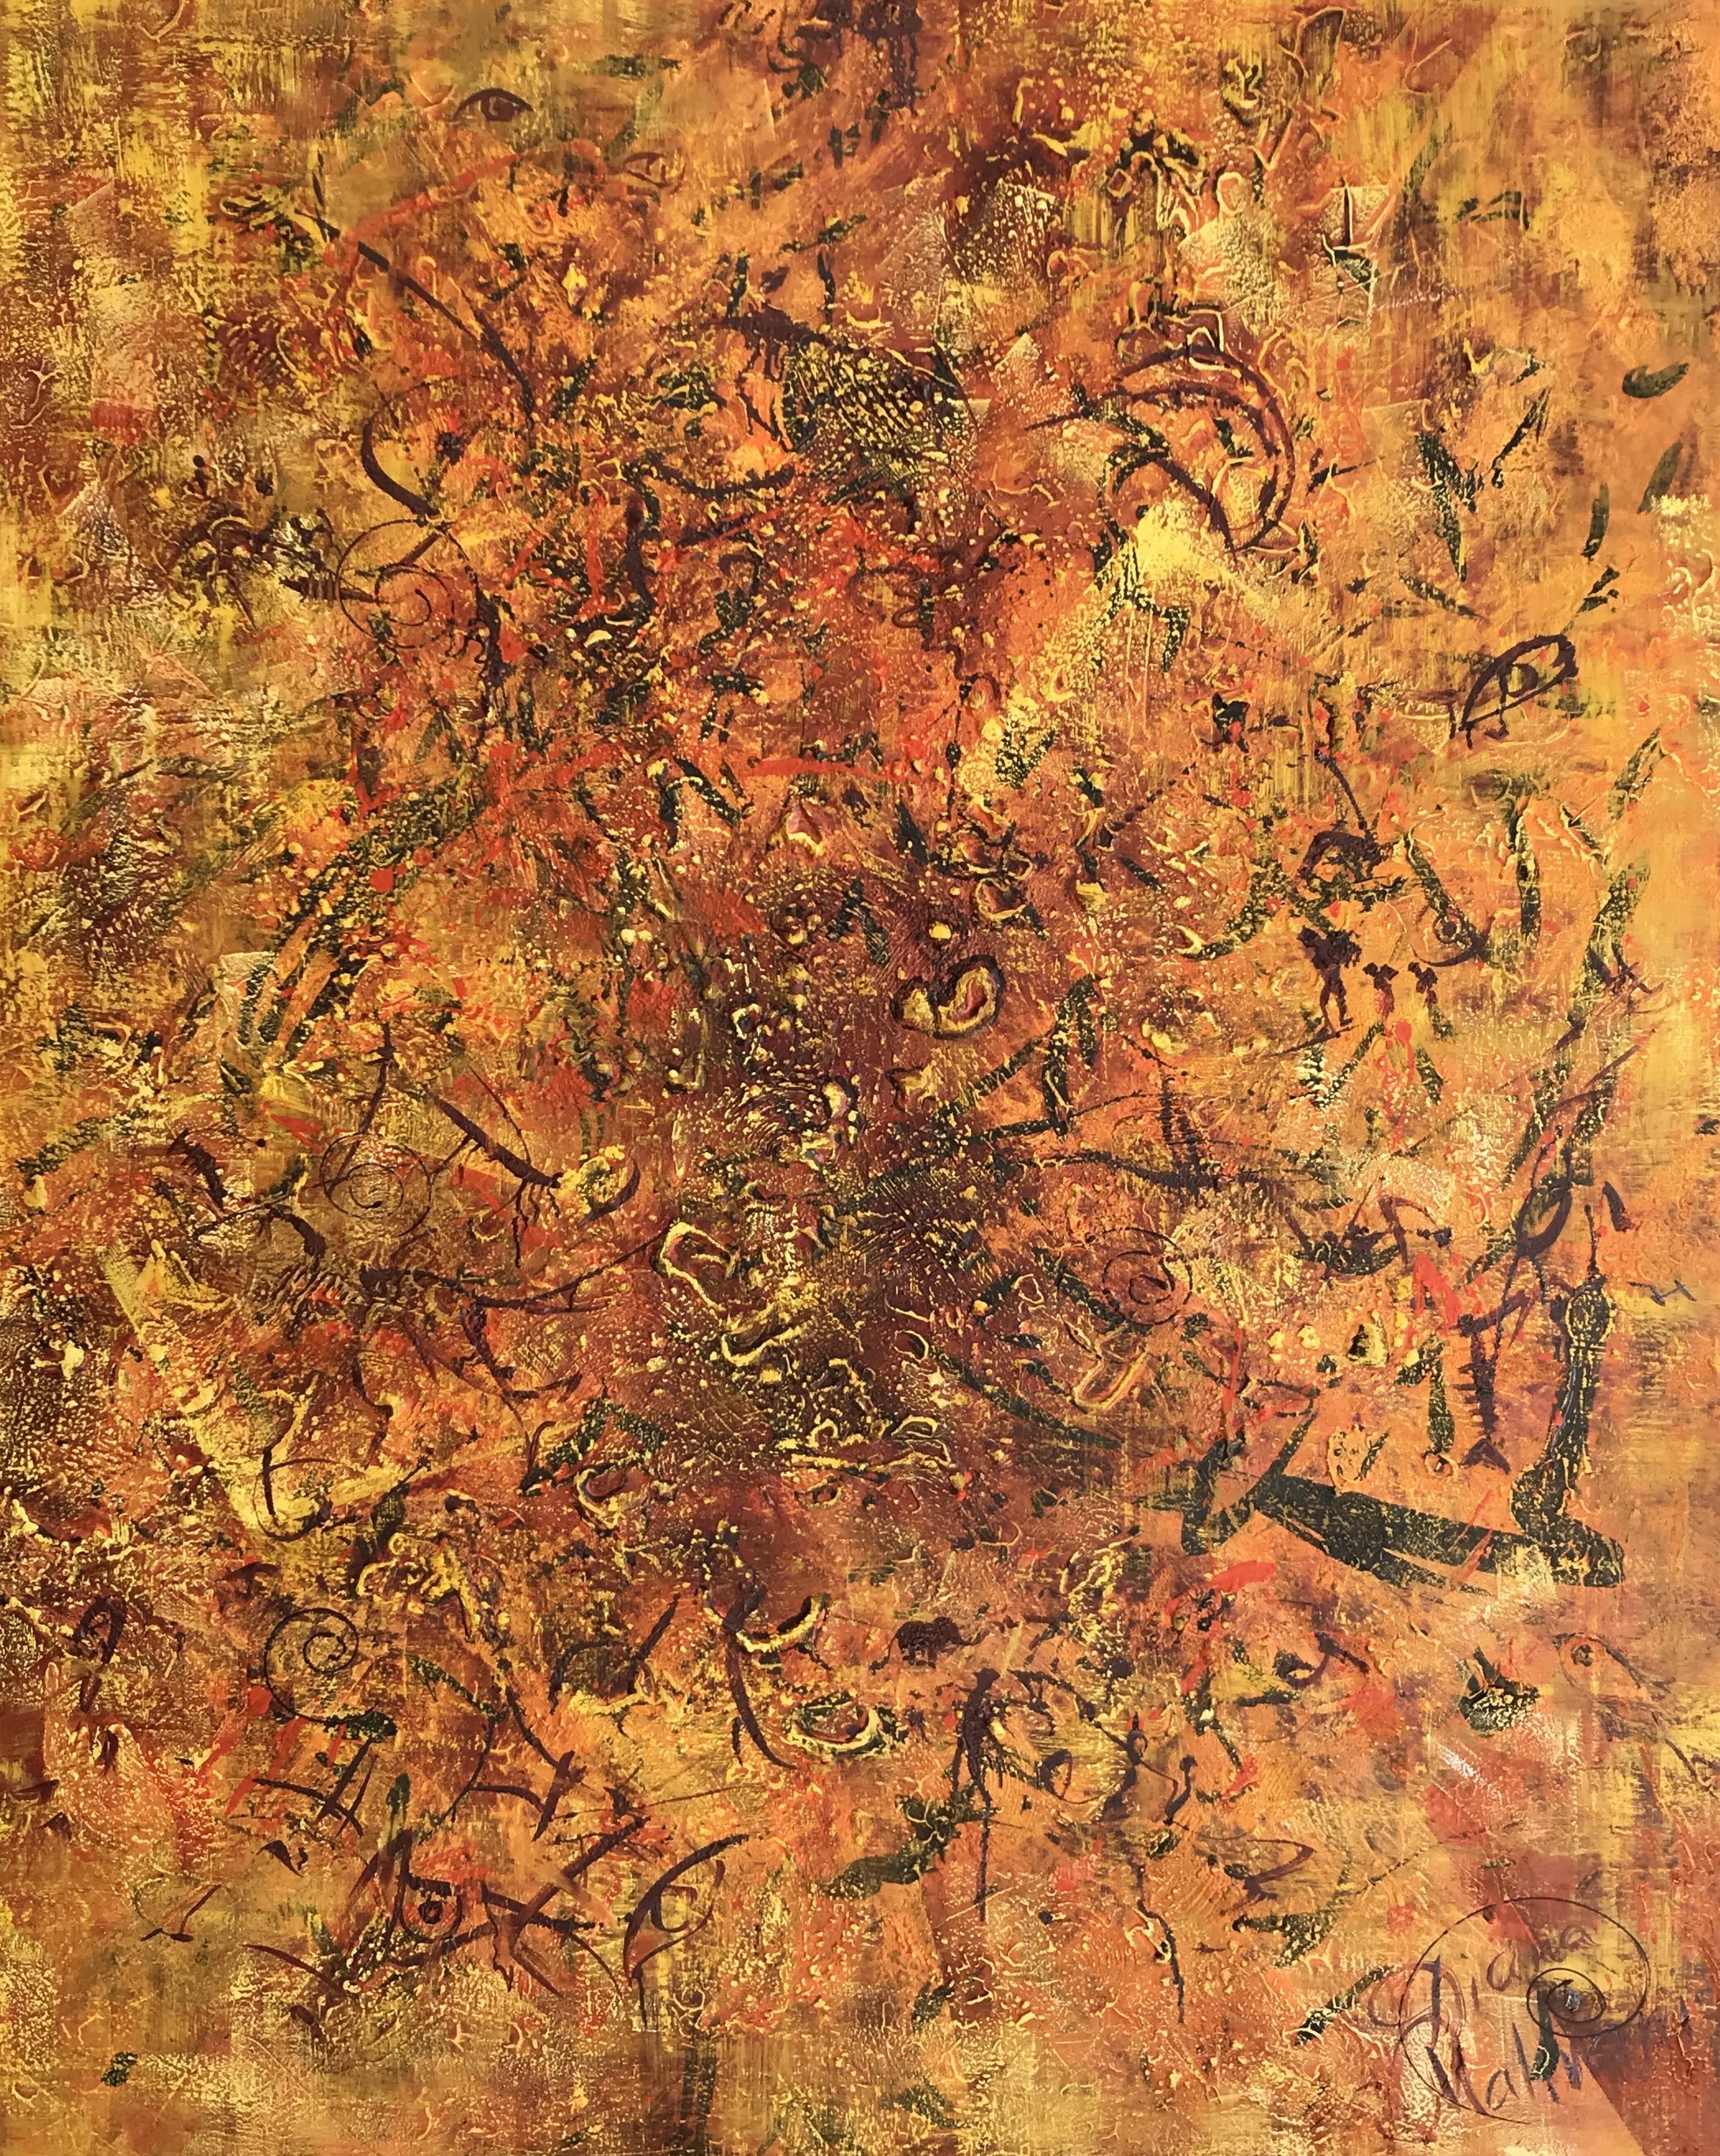 The Sea of Samsara, Painting, Oil on Canvas